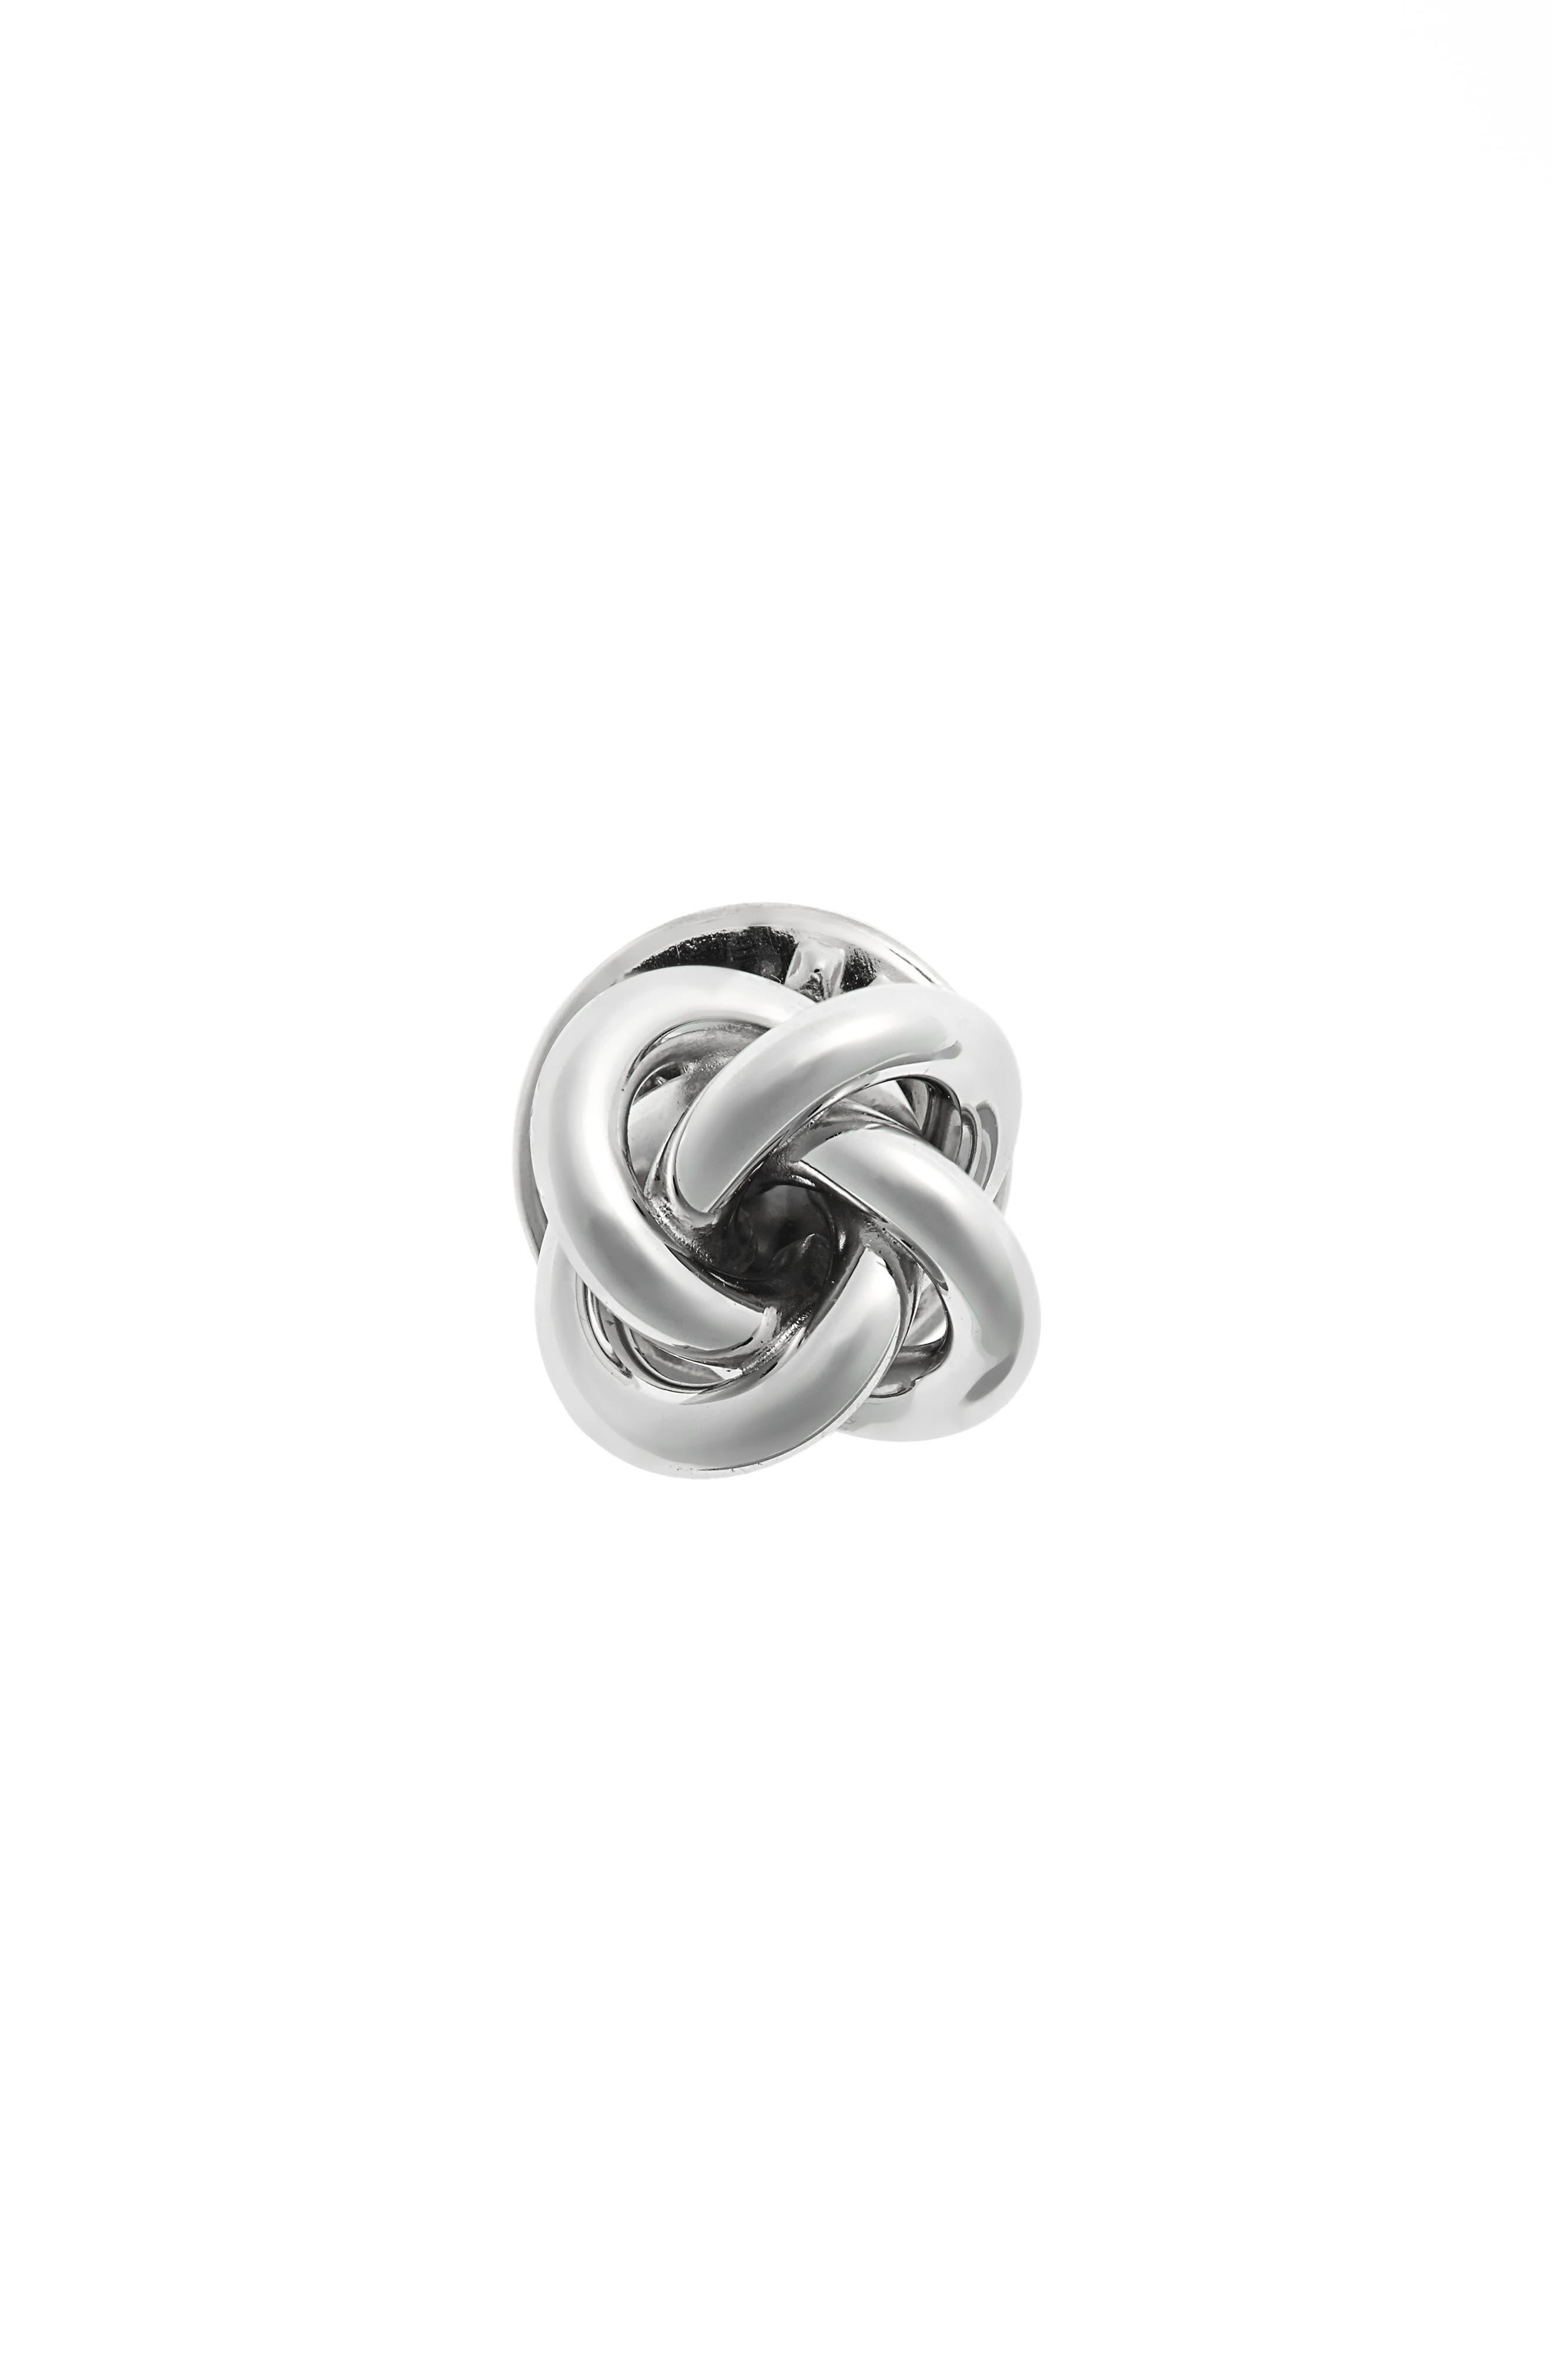 David Donahue Knot Lapel Pin